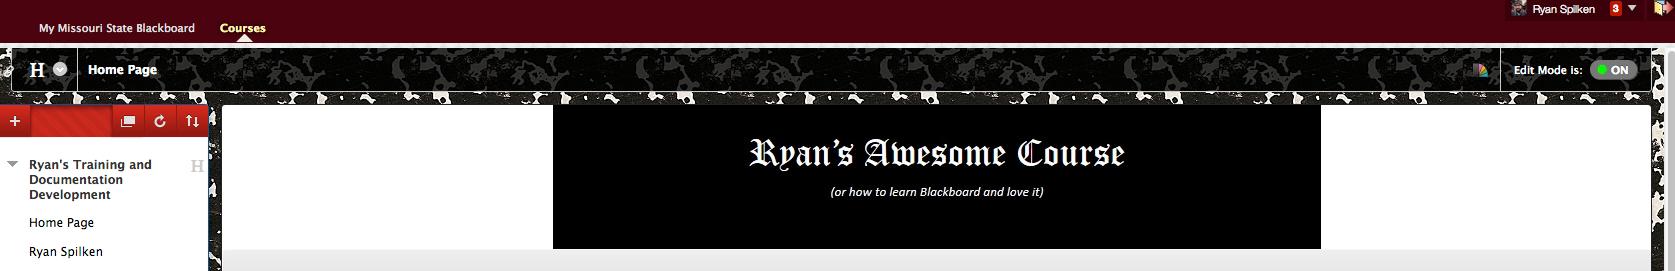 Blackboard page banner